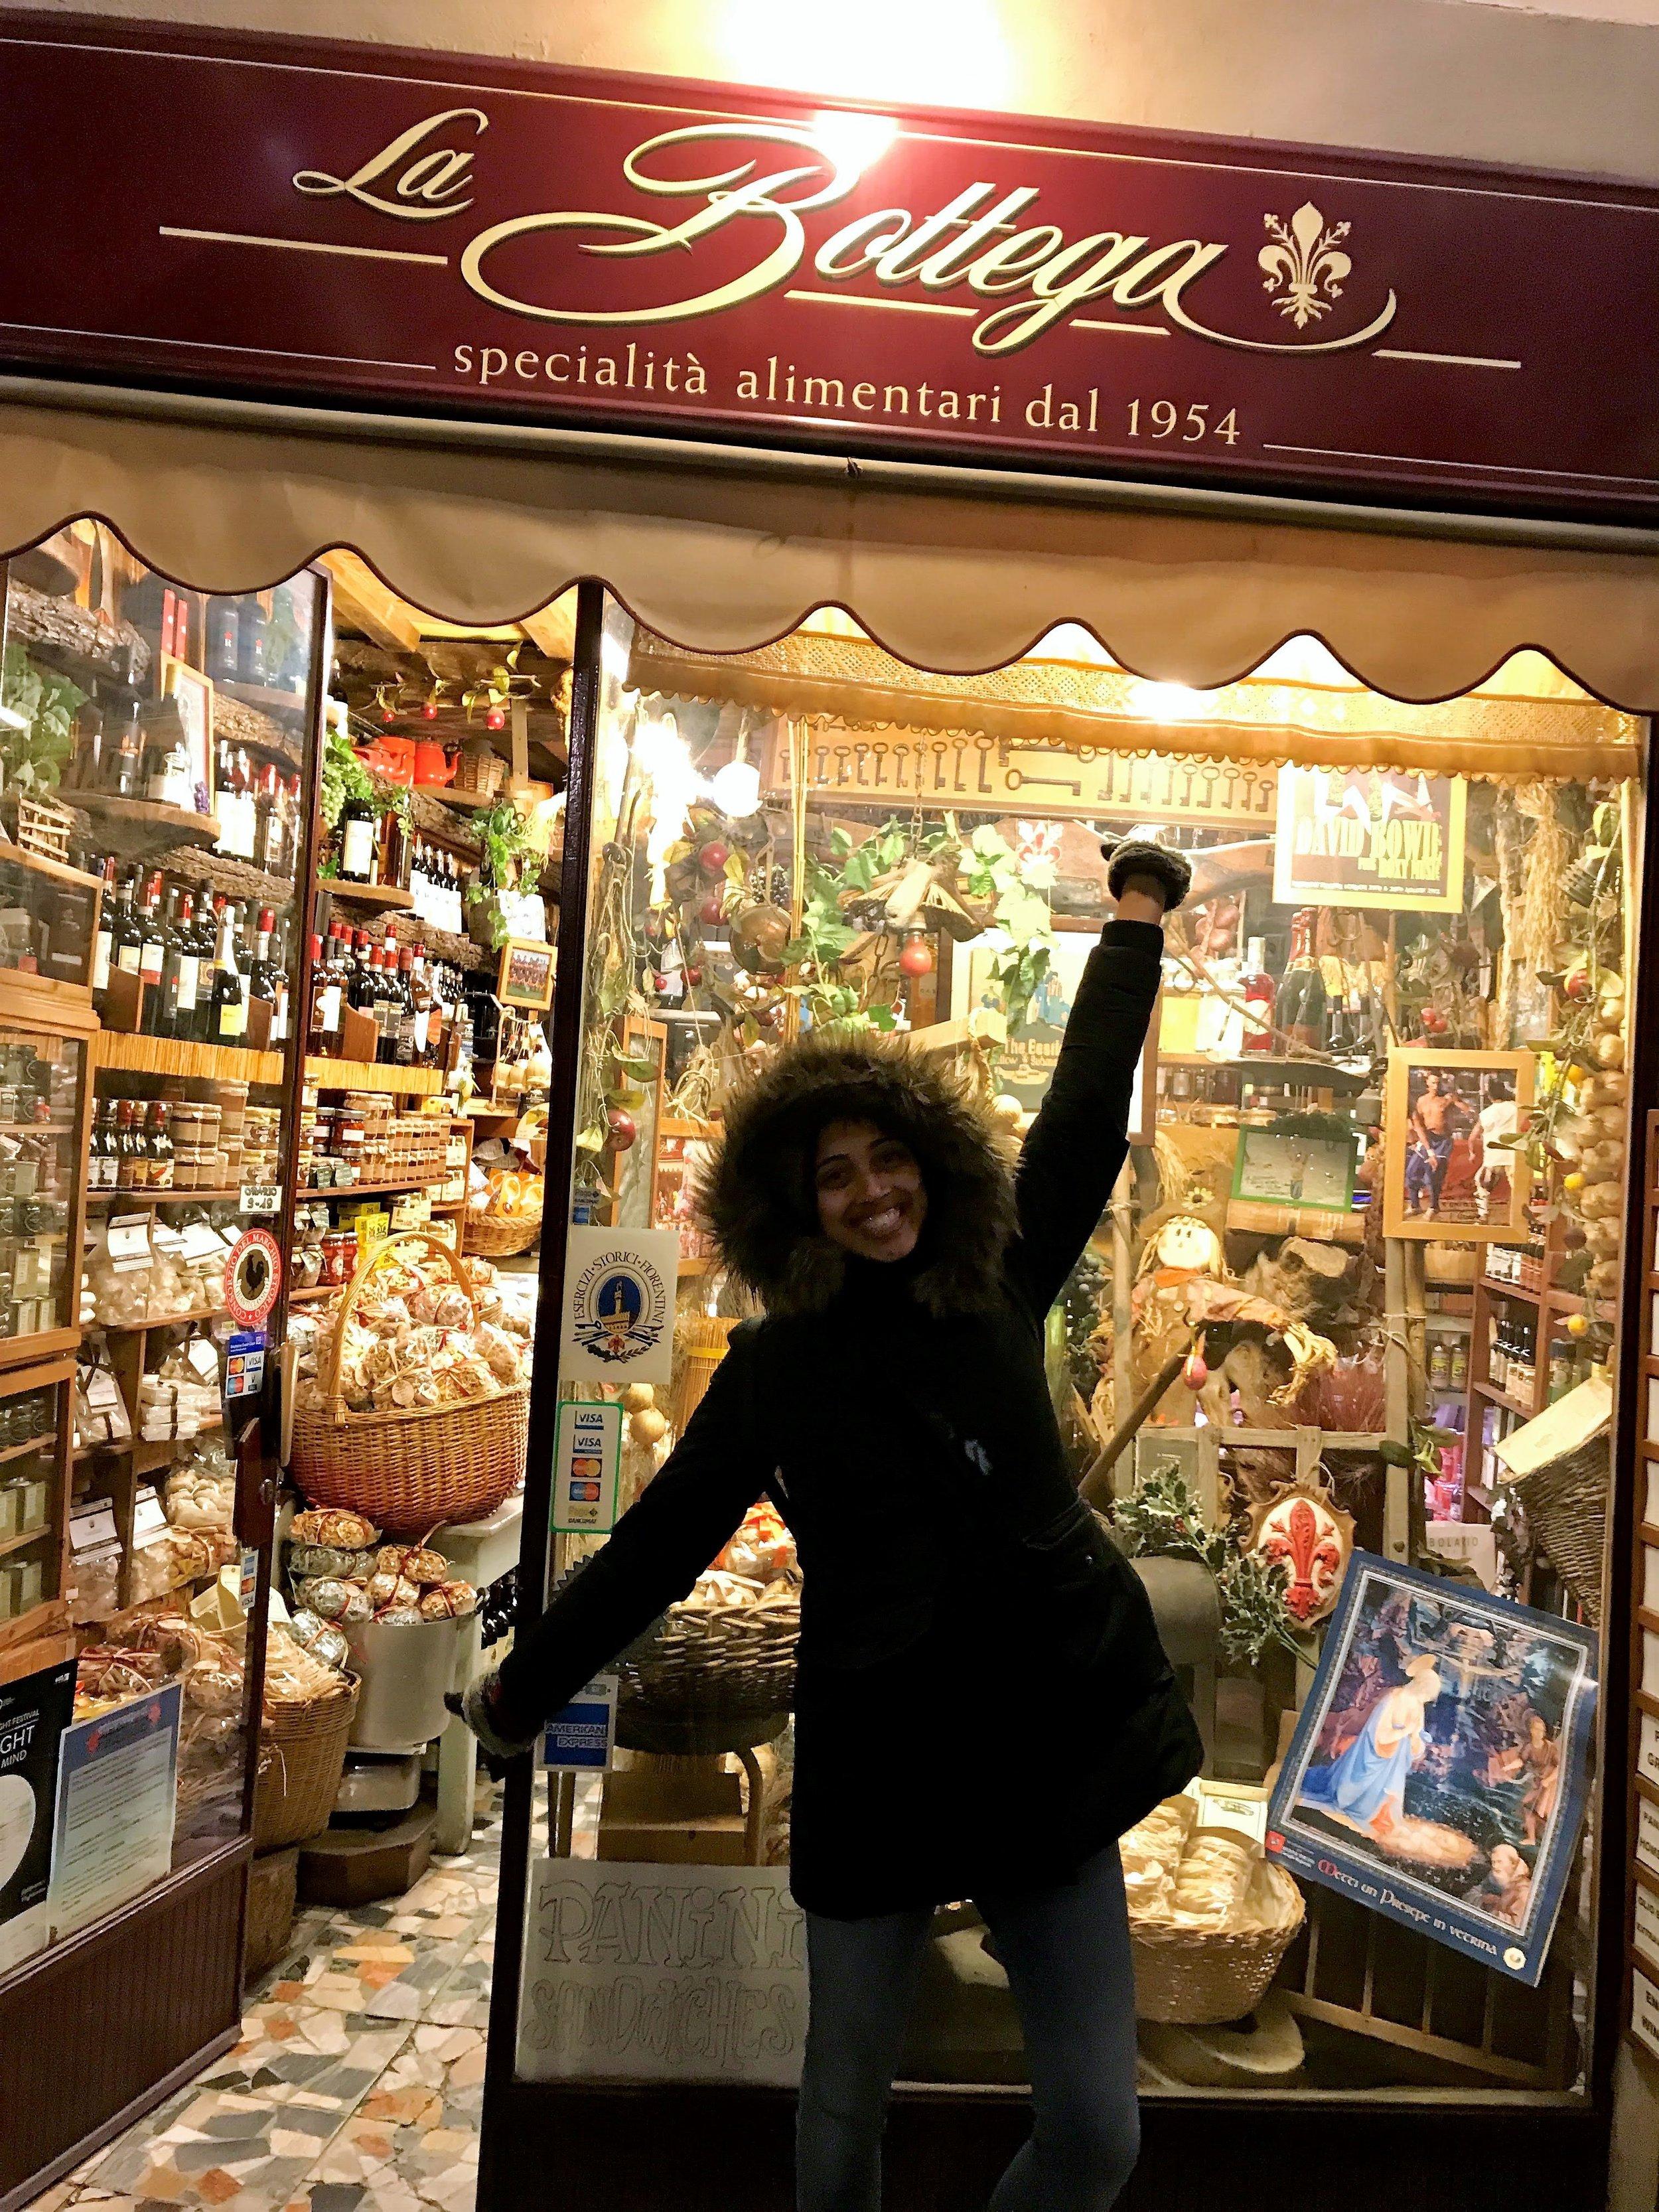 Excited to find vegan biscotti!